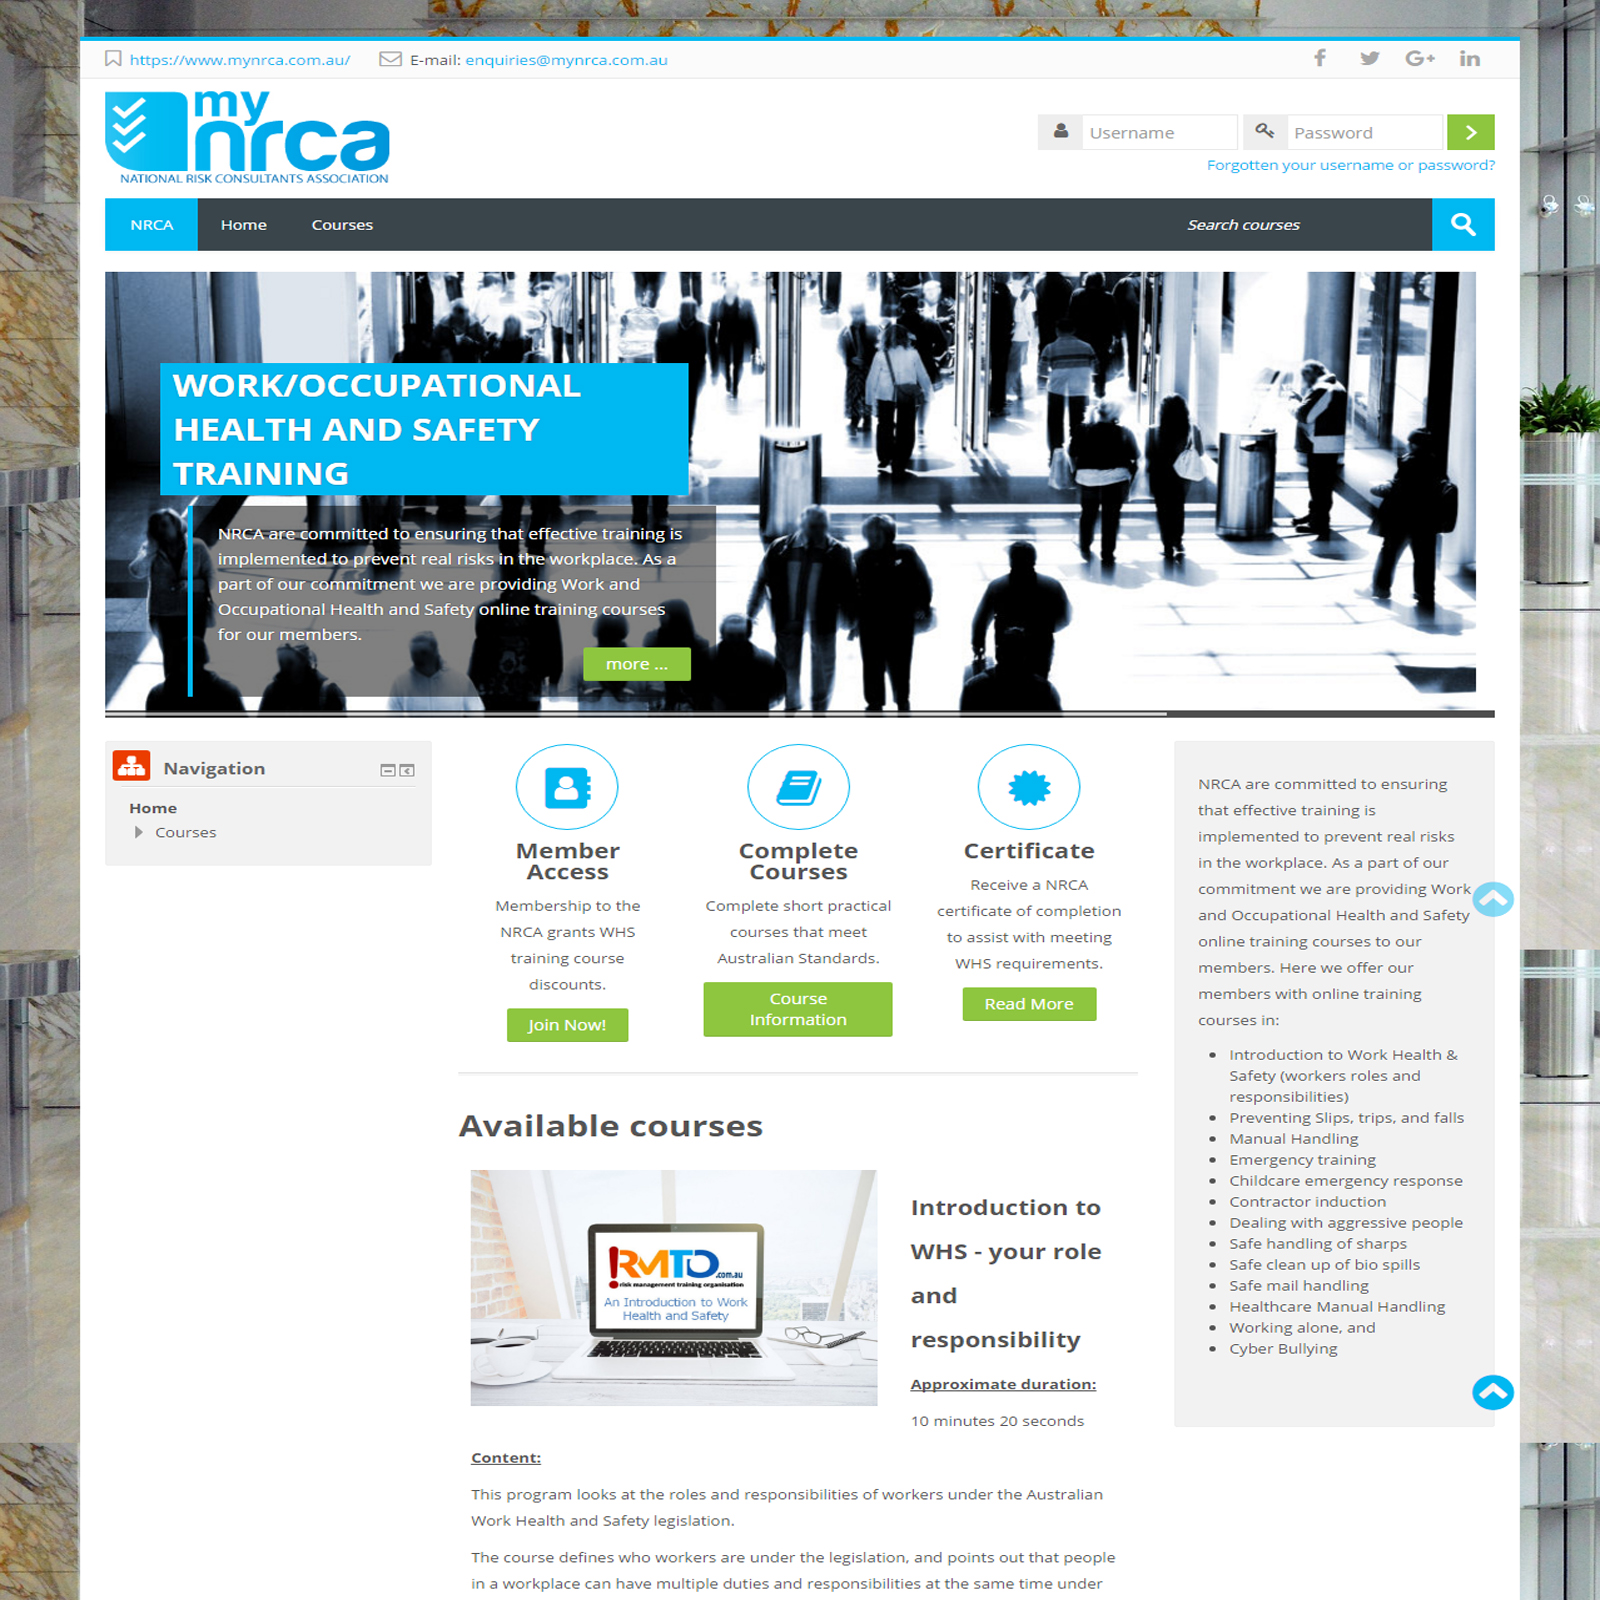 NRCA Staff Training Platform